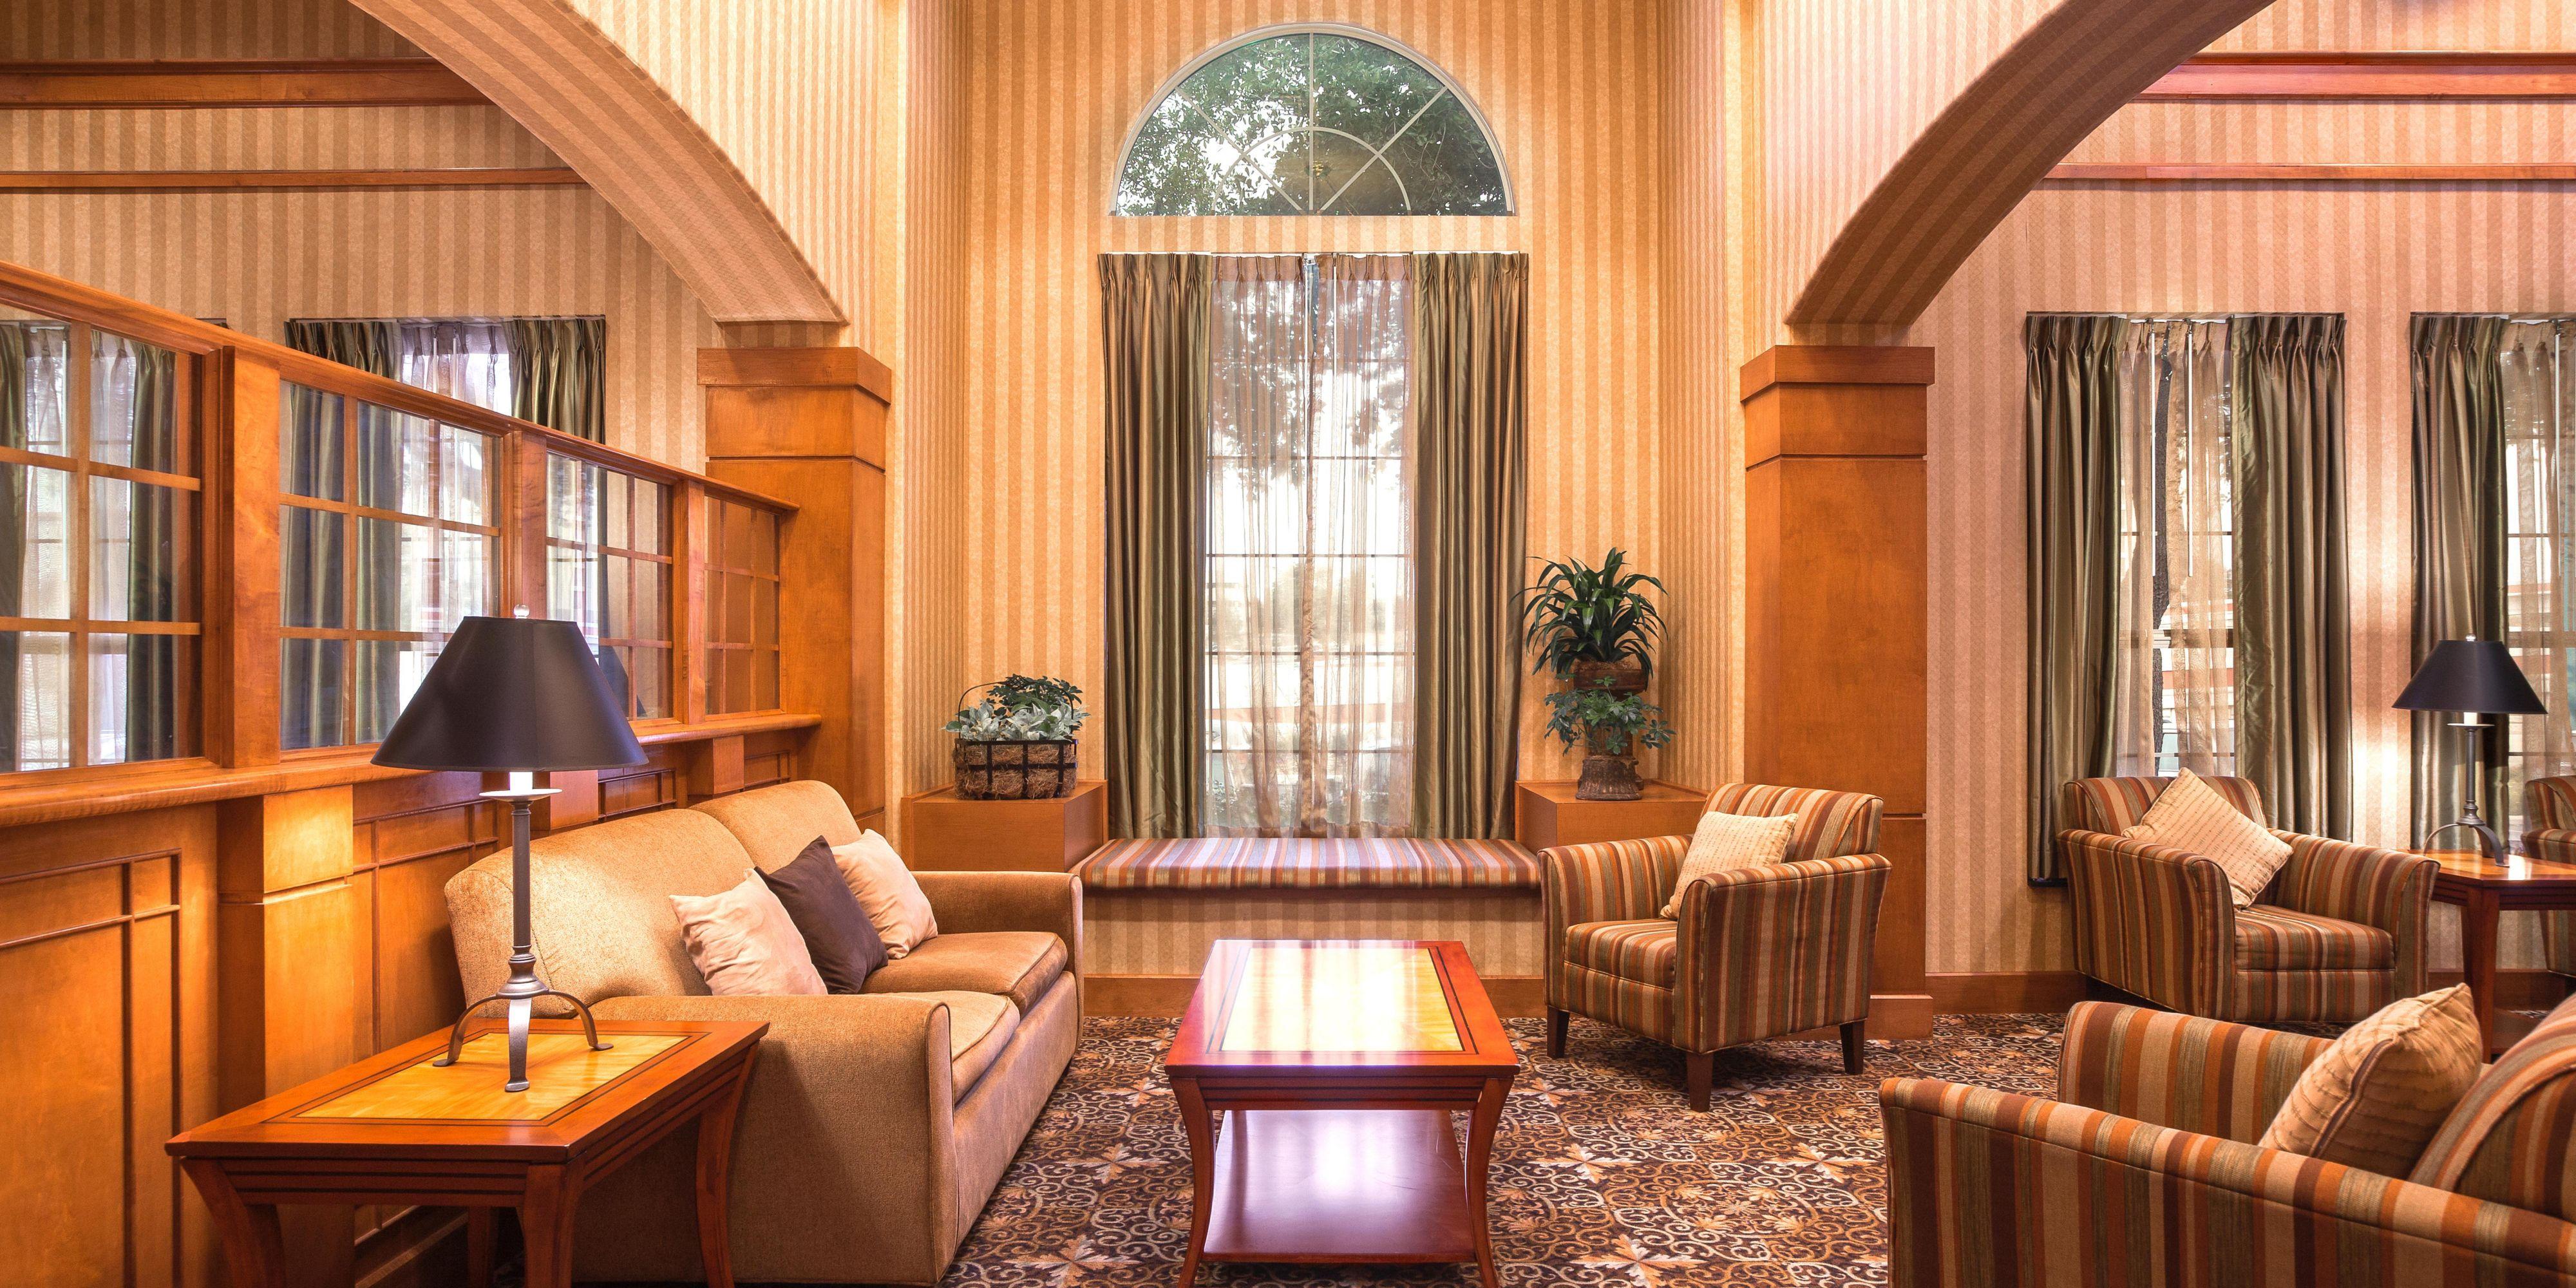 Staybridge Suites San Antonio-Airport - San Antonio, Tejas